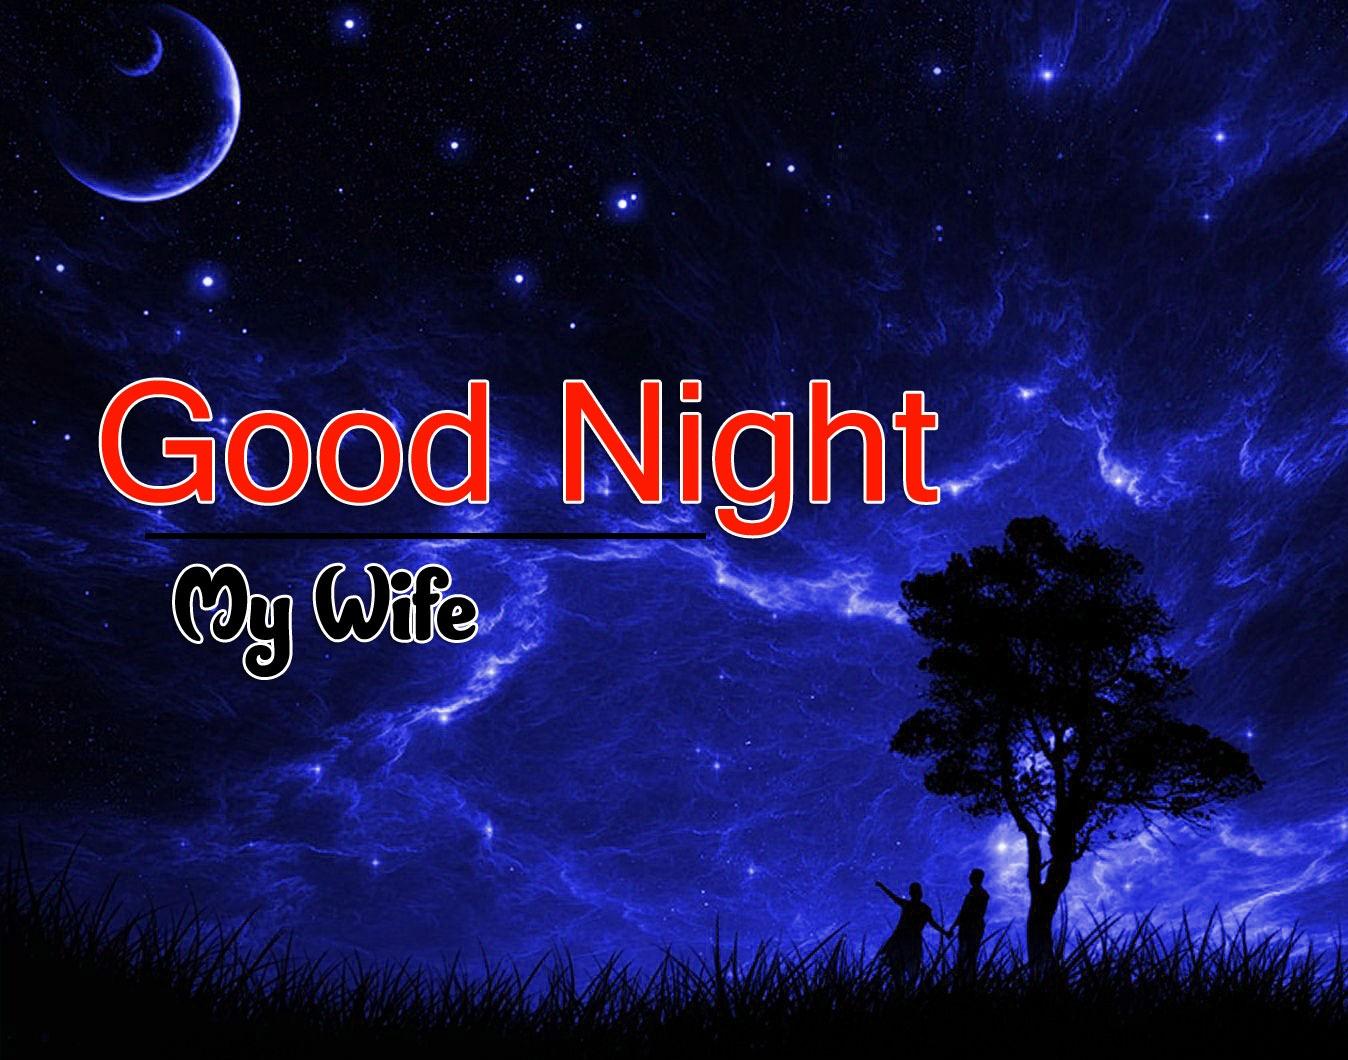 Beautiful Good Night Wallpaper hd